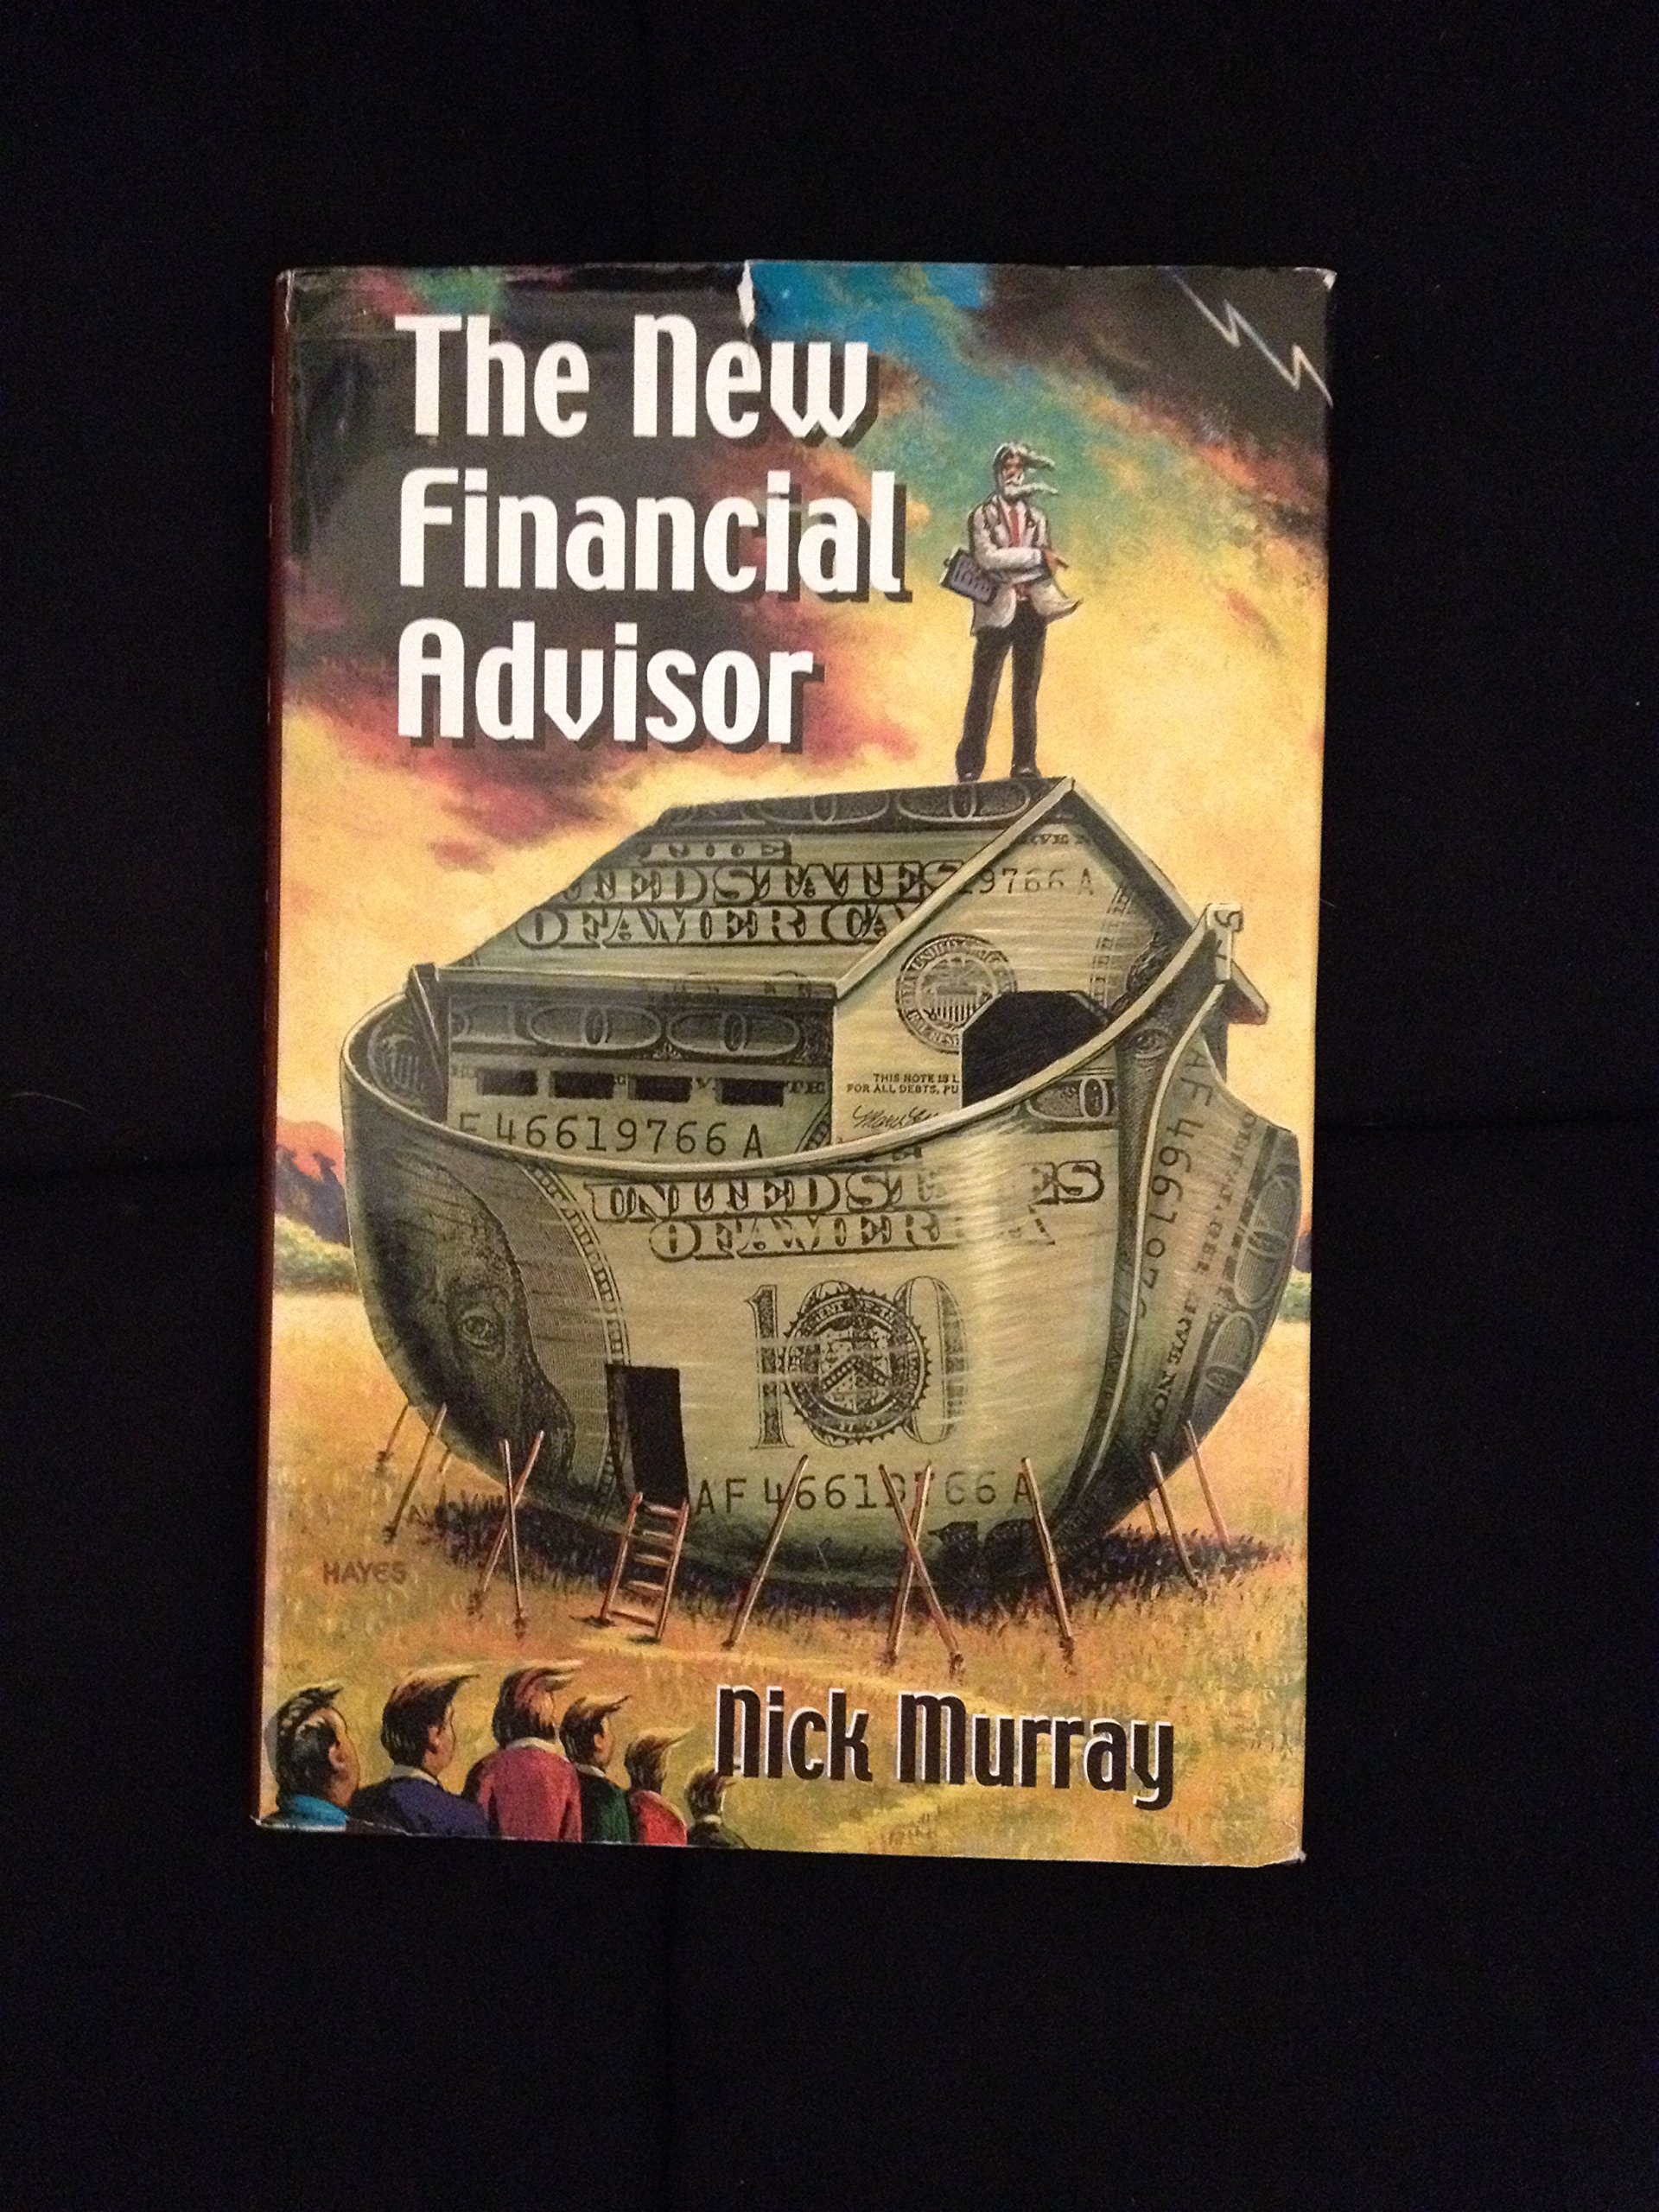 The new financial advisor nick murray 9780966976328 amazon the new financial advisor nick murray 9780966976328 amazon books magicingreecefo Images